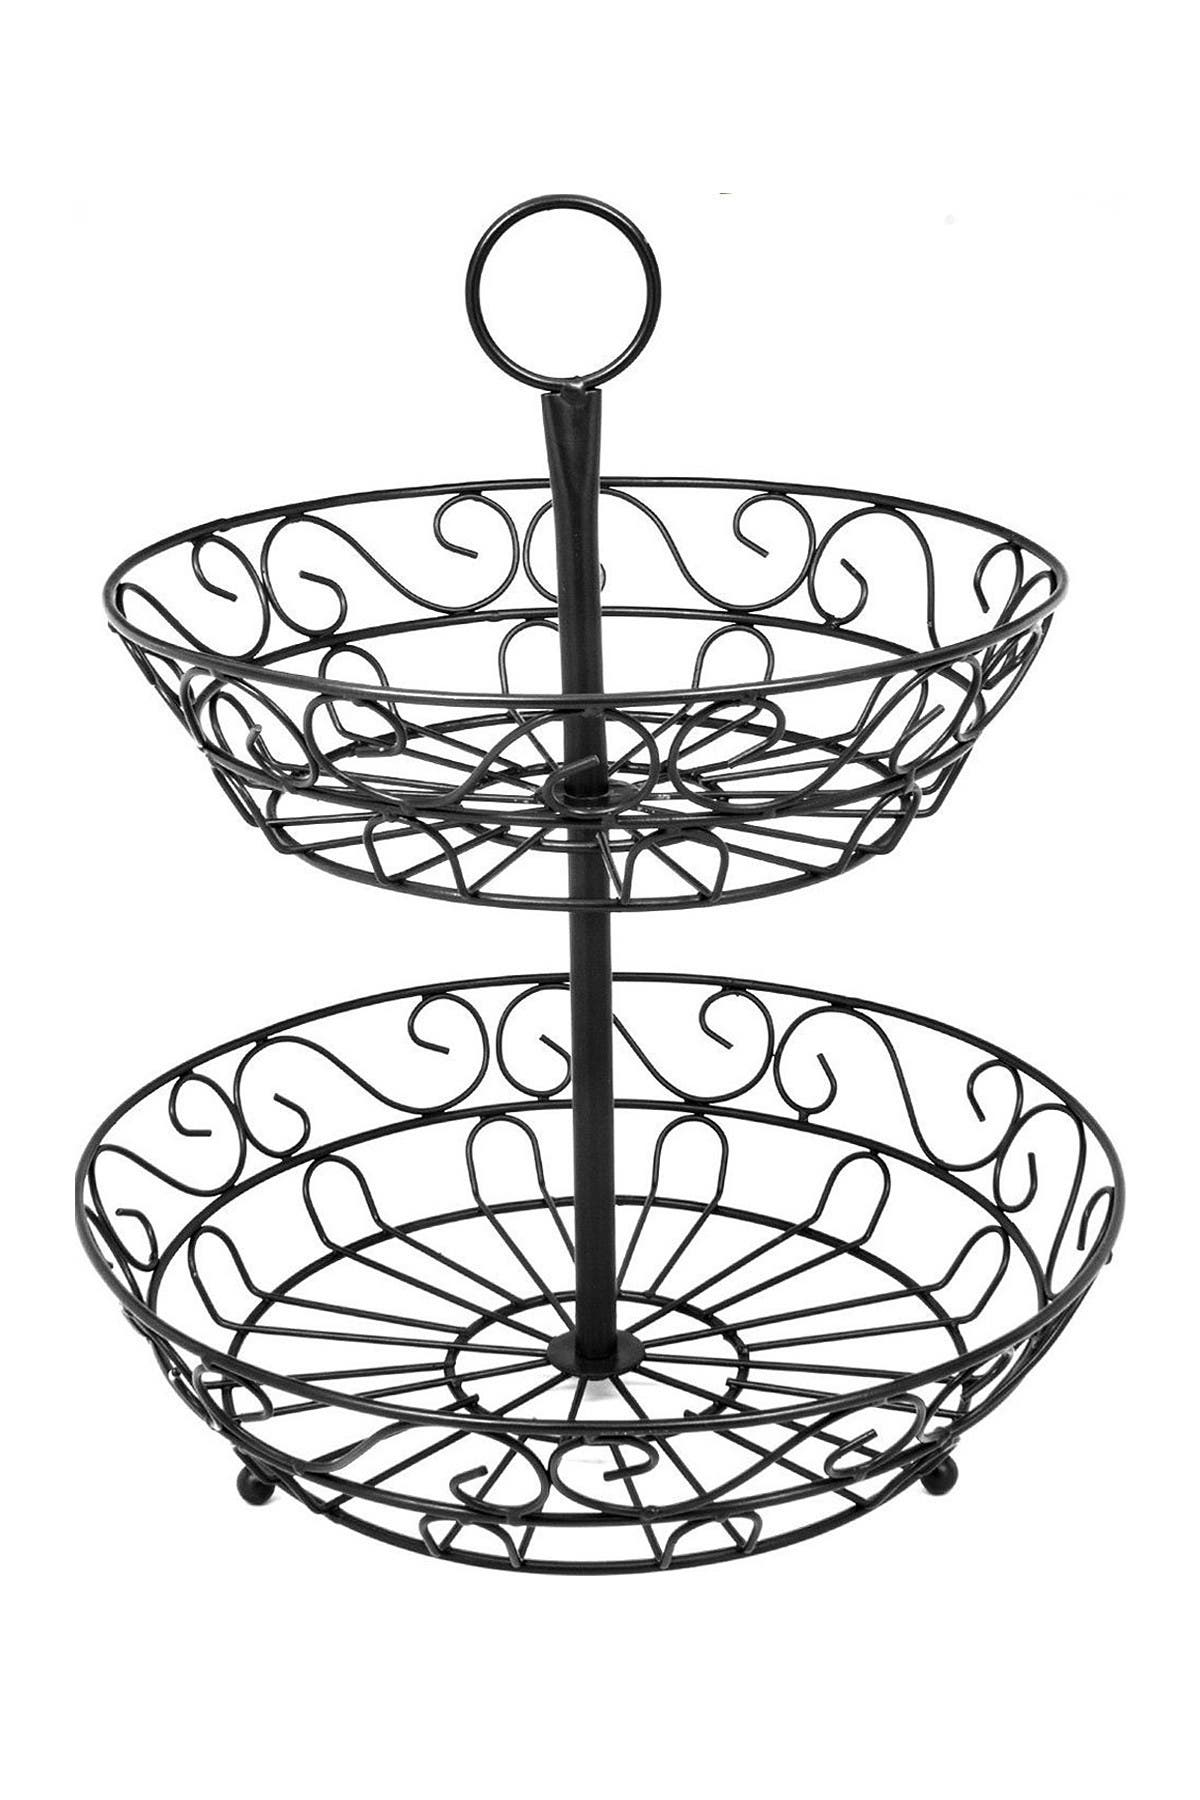 Image of Sorbus Black 2-Tier Countertop Fruit Basket Holder & Decorative Bowl Stand